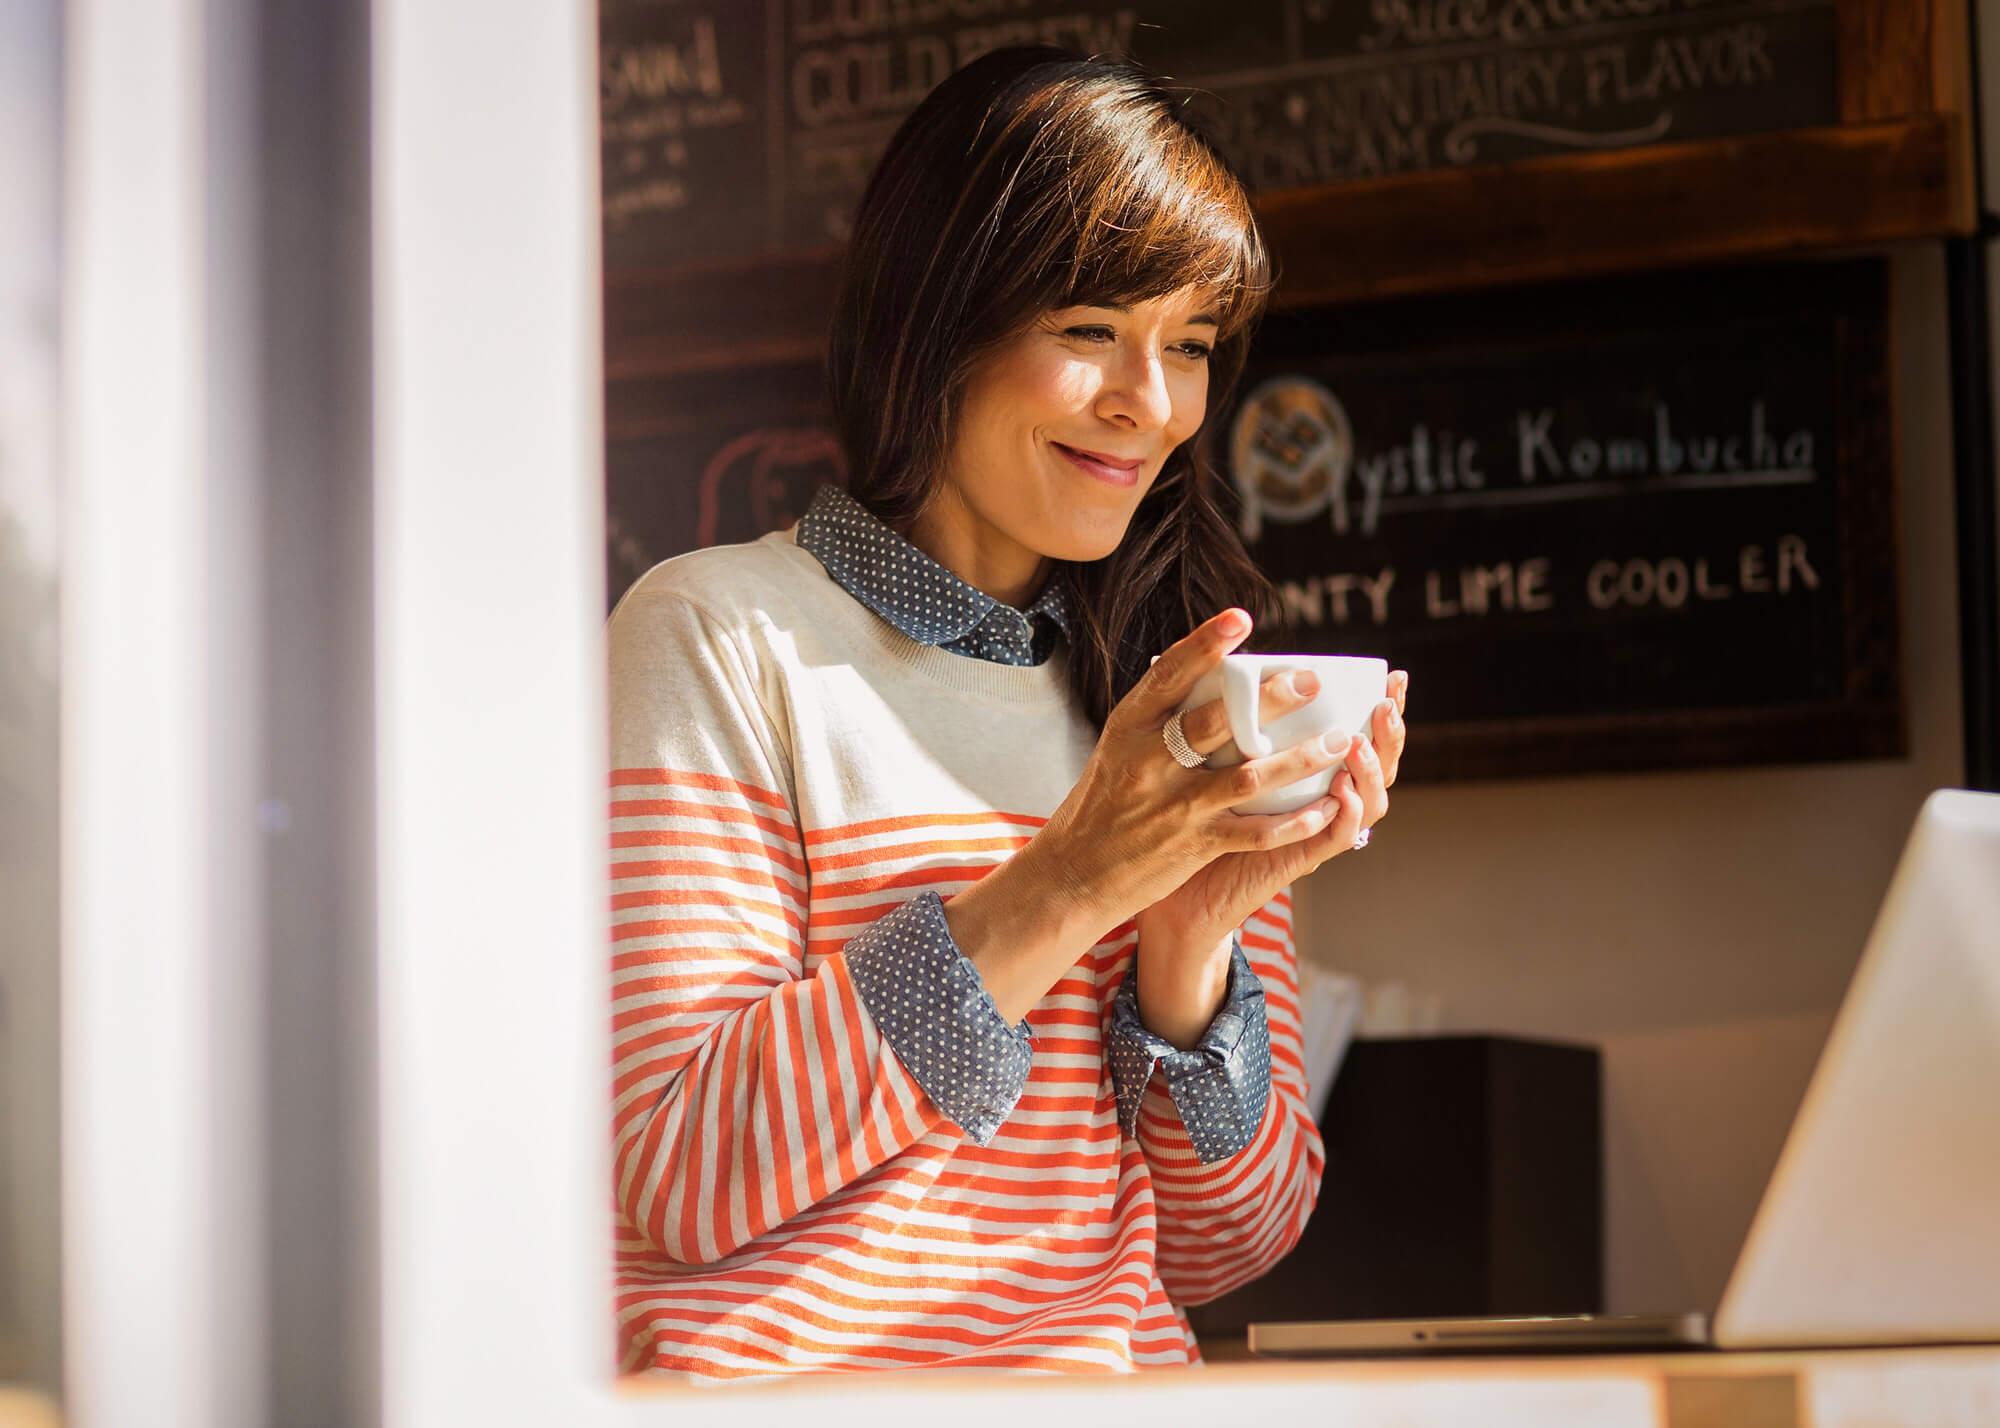 Woman at window ledge holding coffee